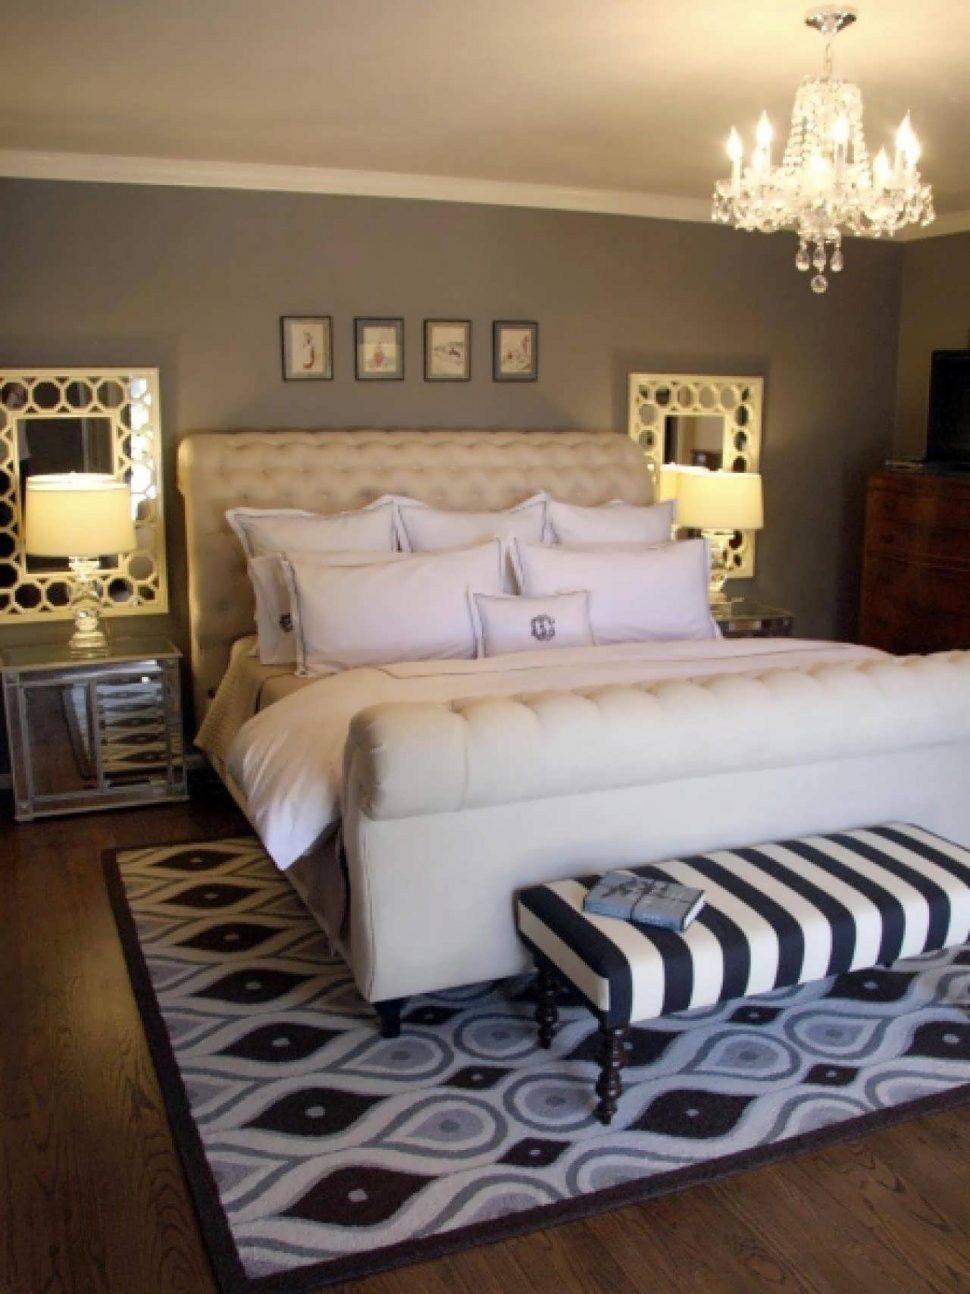 Couple Bedroom Ideas Bedroom More 5 Best Cute Couple Bedroom Ideas